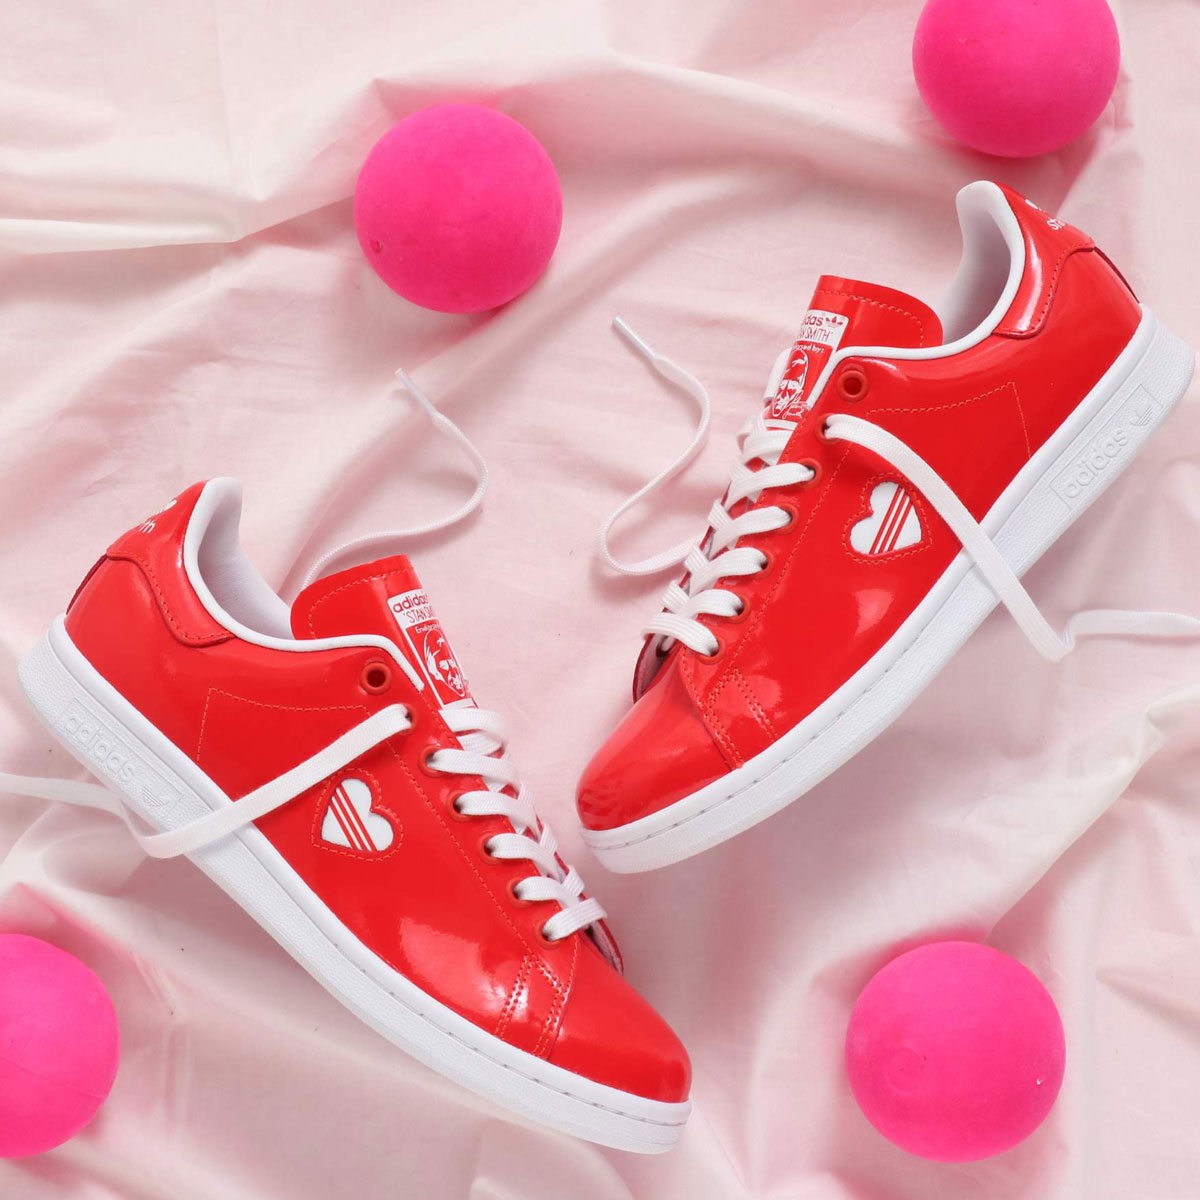 adidas Originals STAN SMITH W(アディダスオリジナルス スタンスミス W)ACTIVE RED/RUNNING WHITE/ACTIVE RED【レディース スニーカー】19SS-I